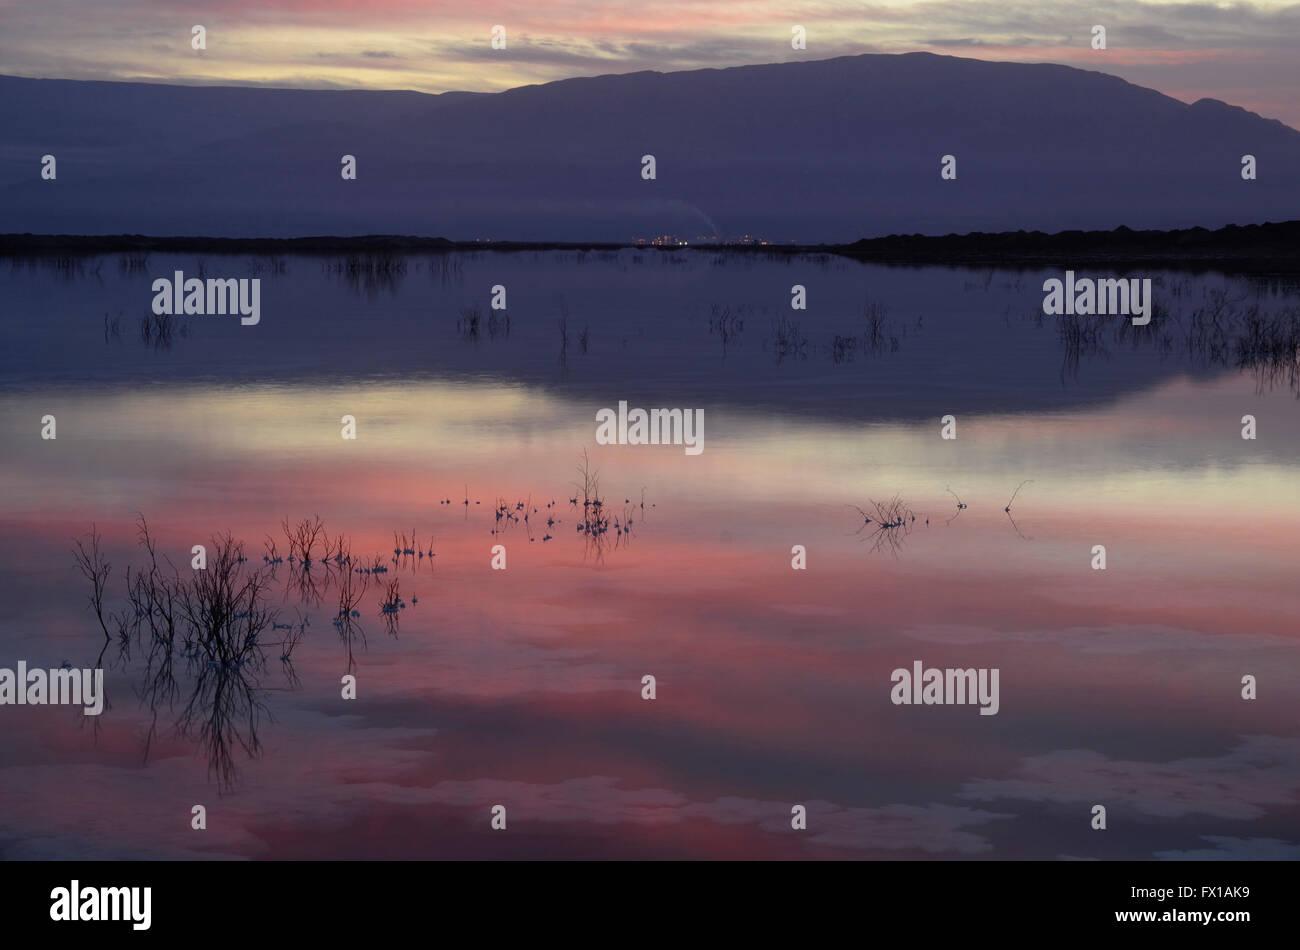 Israel, Dead Sea at dawn - Stock Image